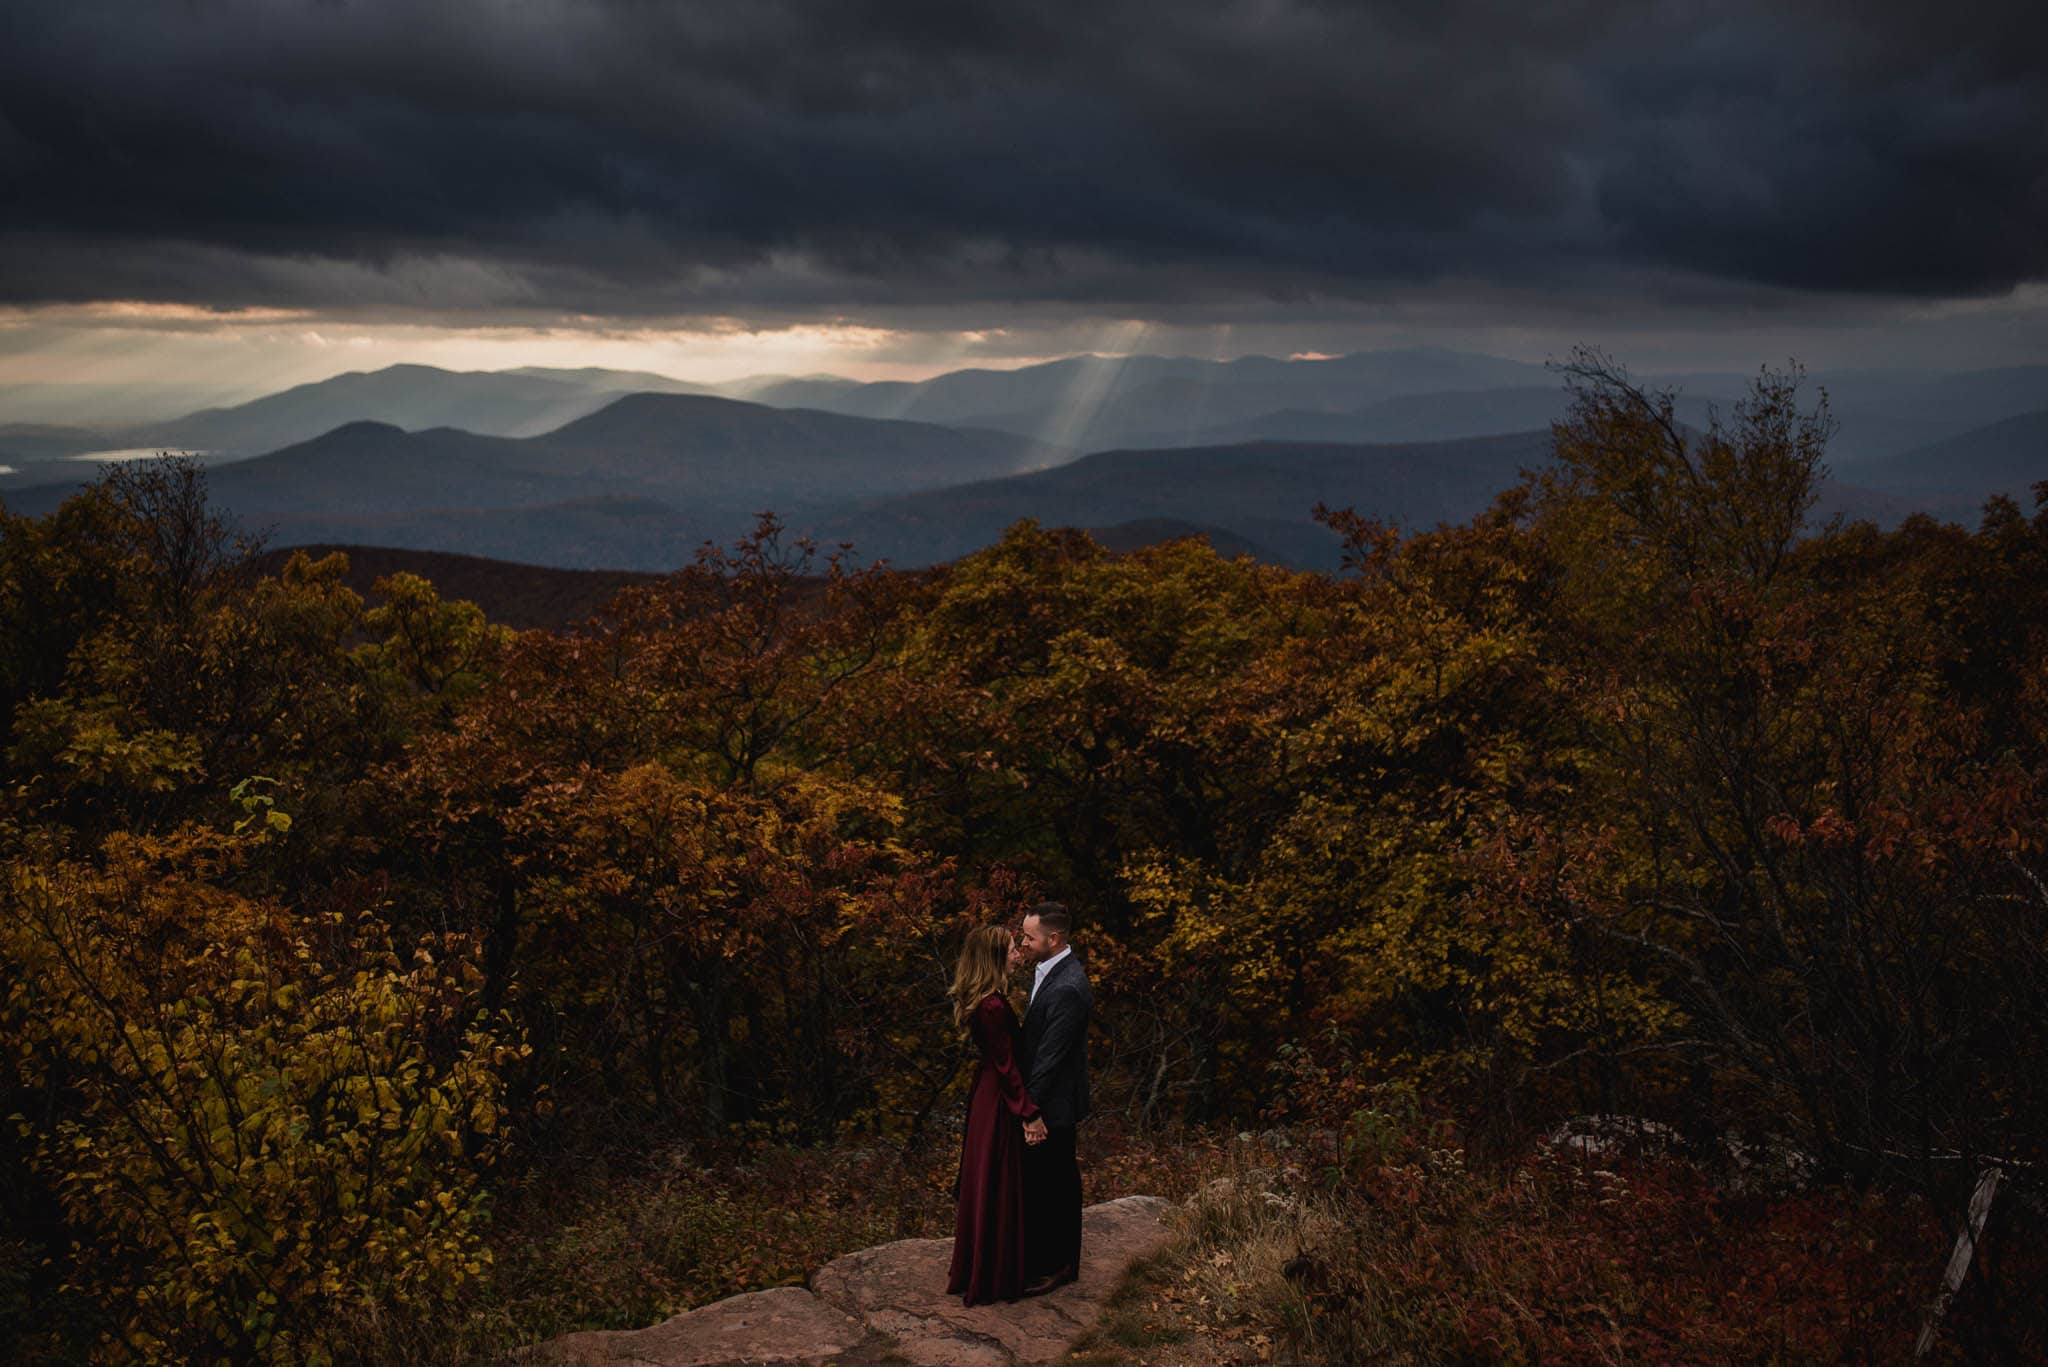 overlook-mountain-engagement-04